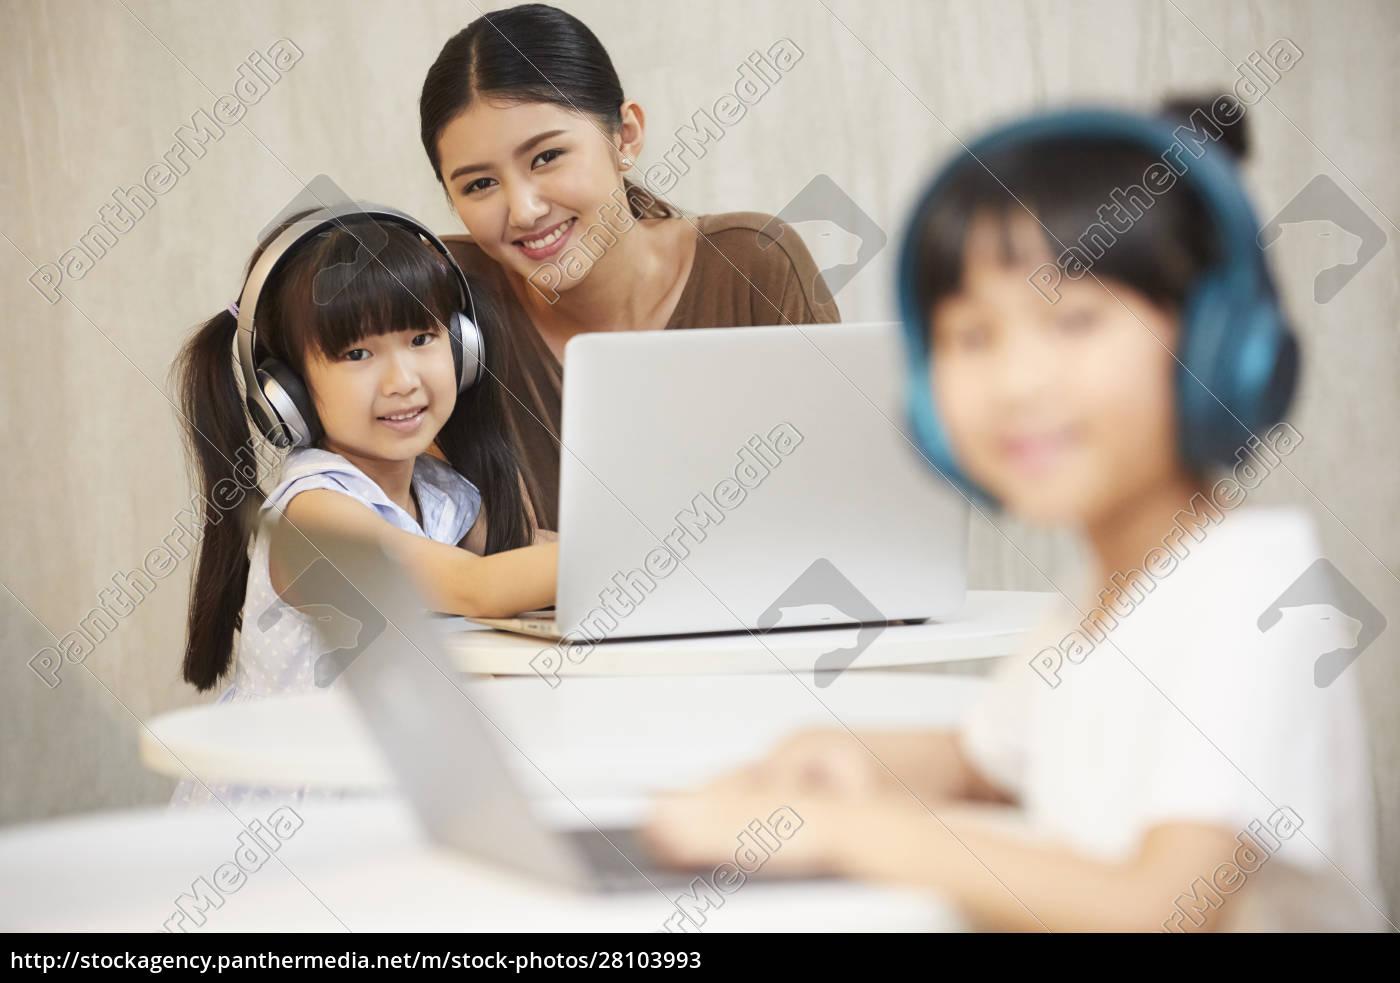 schoolchild, school, life - 28103993